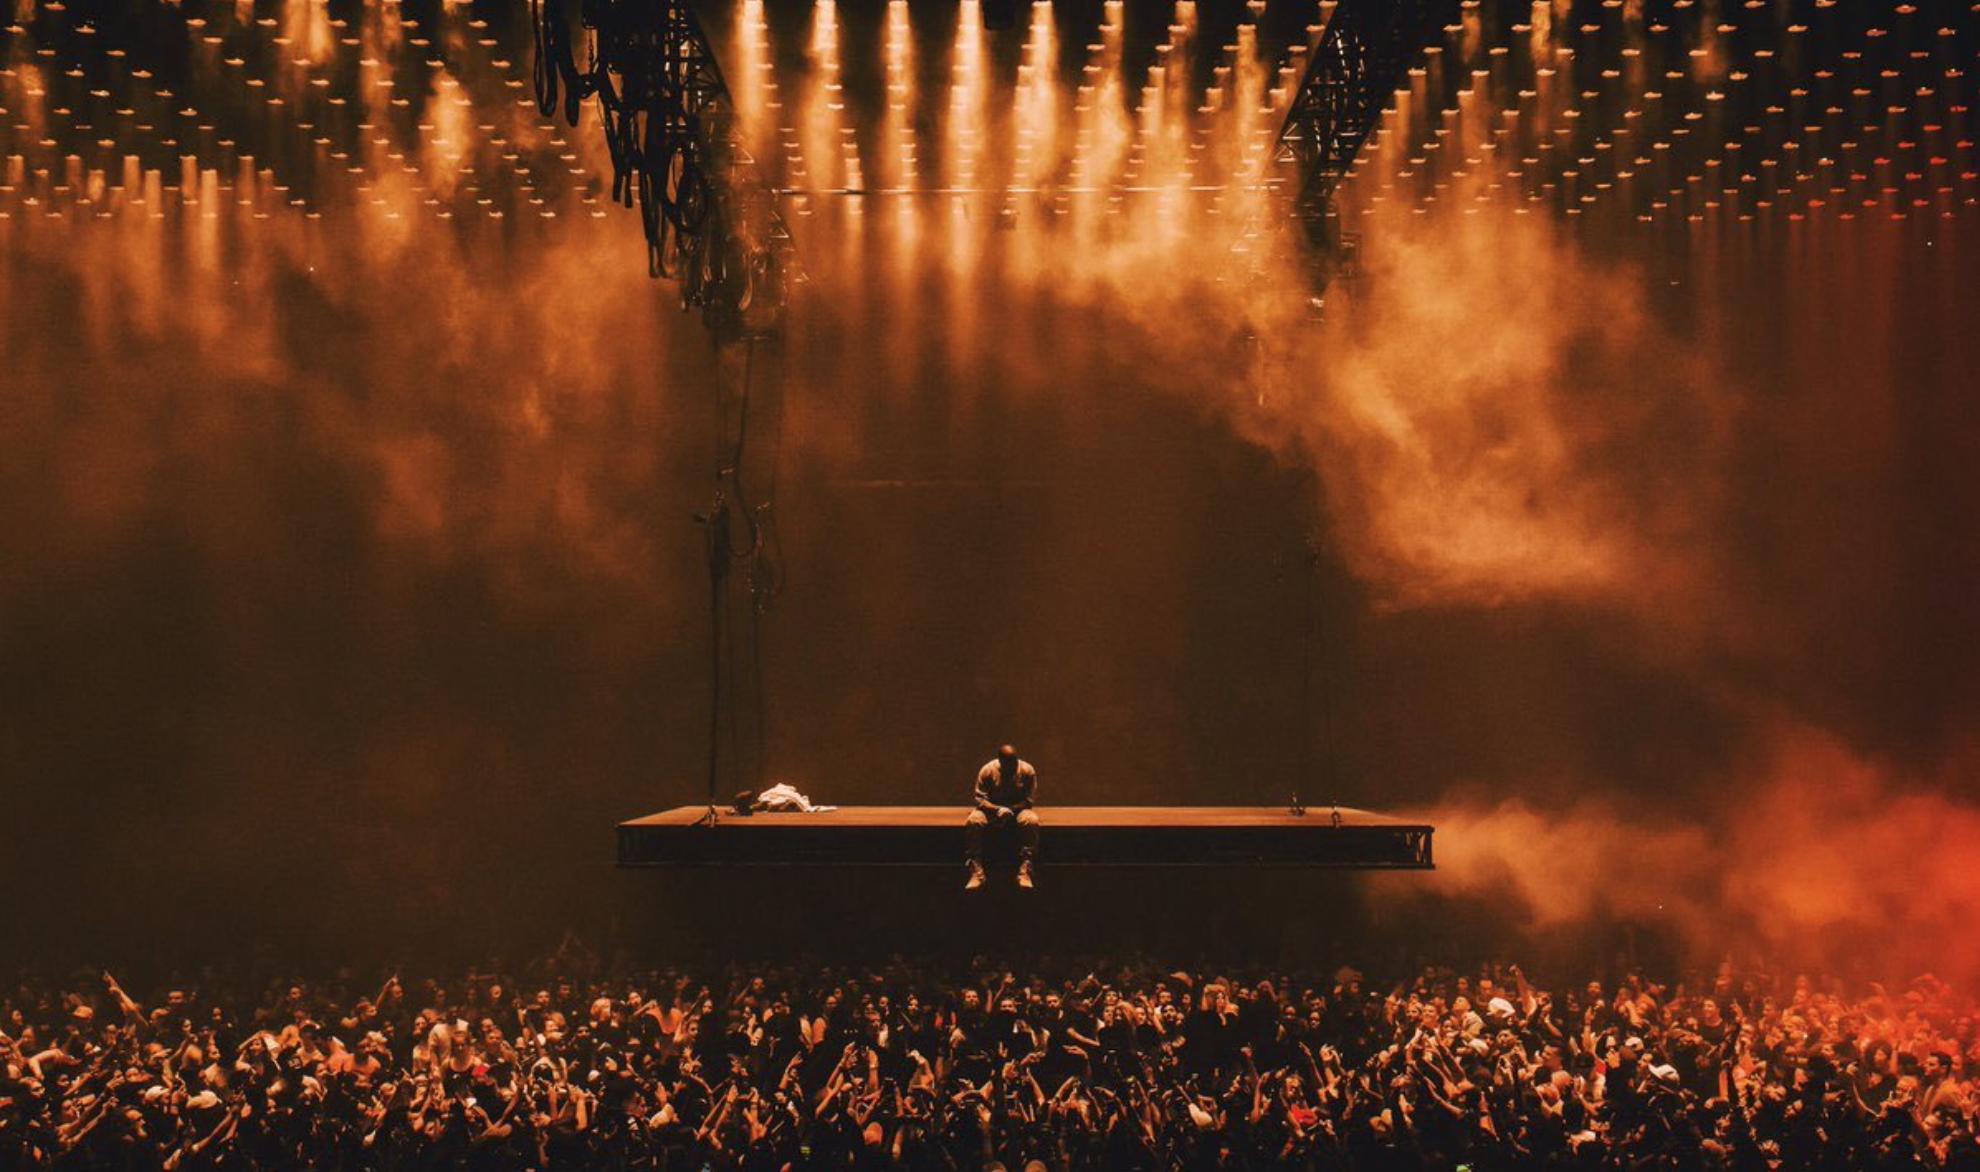 Kanye West 'Saint Pablo' tour (2016) creative direction: Virgil Abloh & Donda